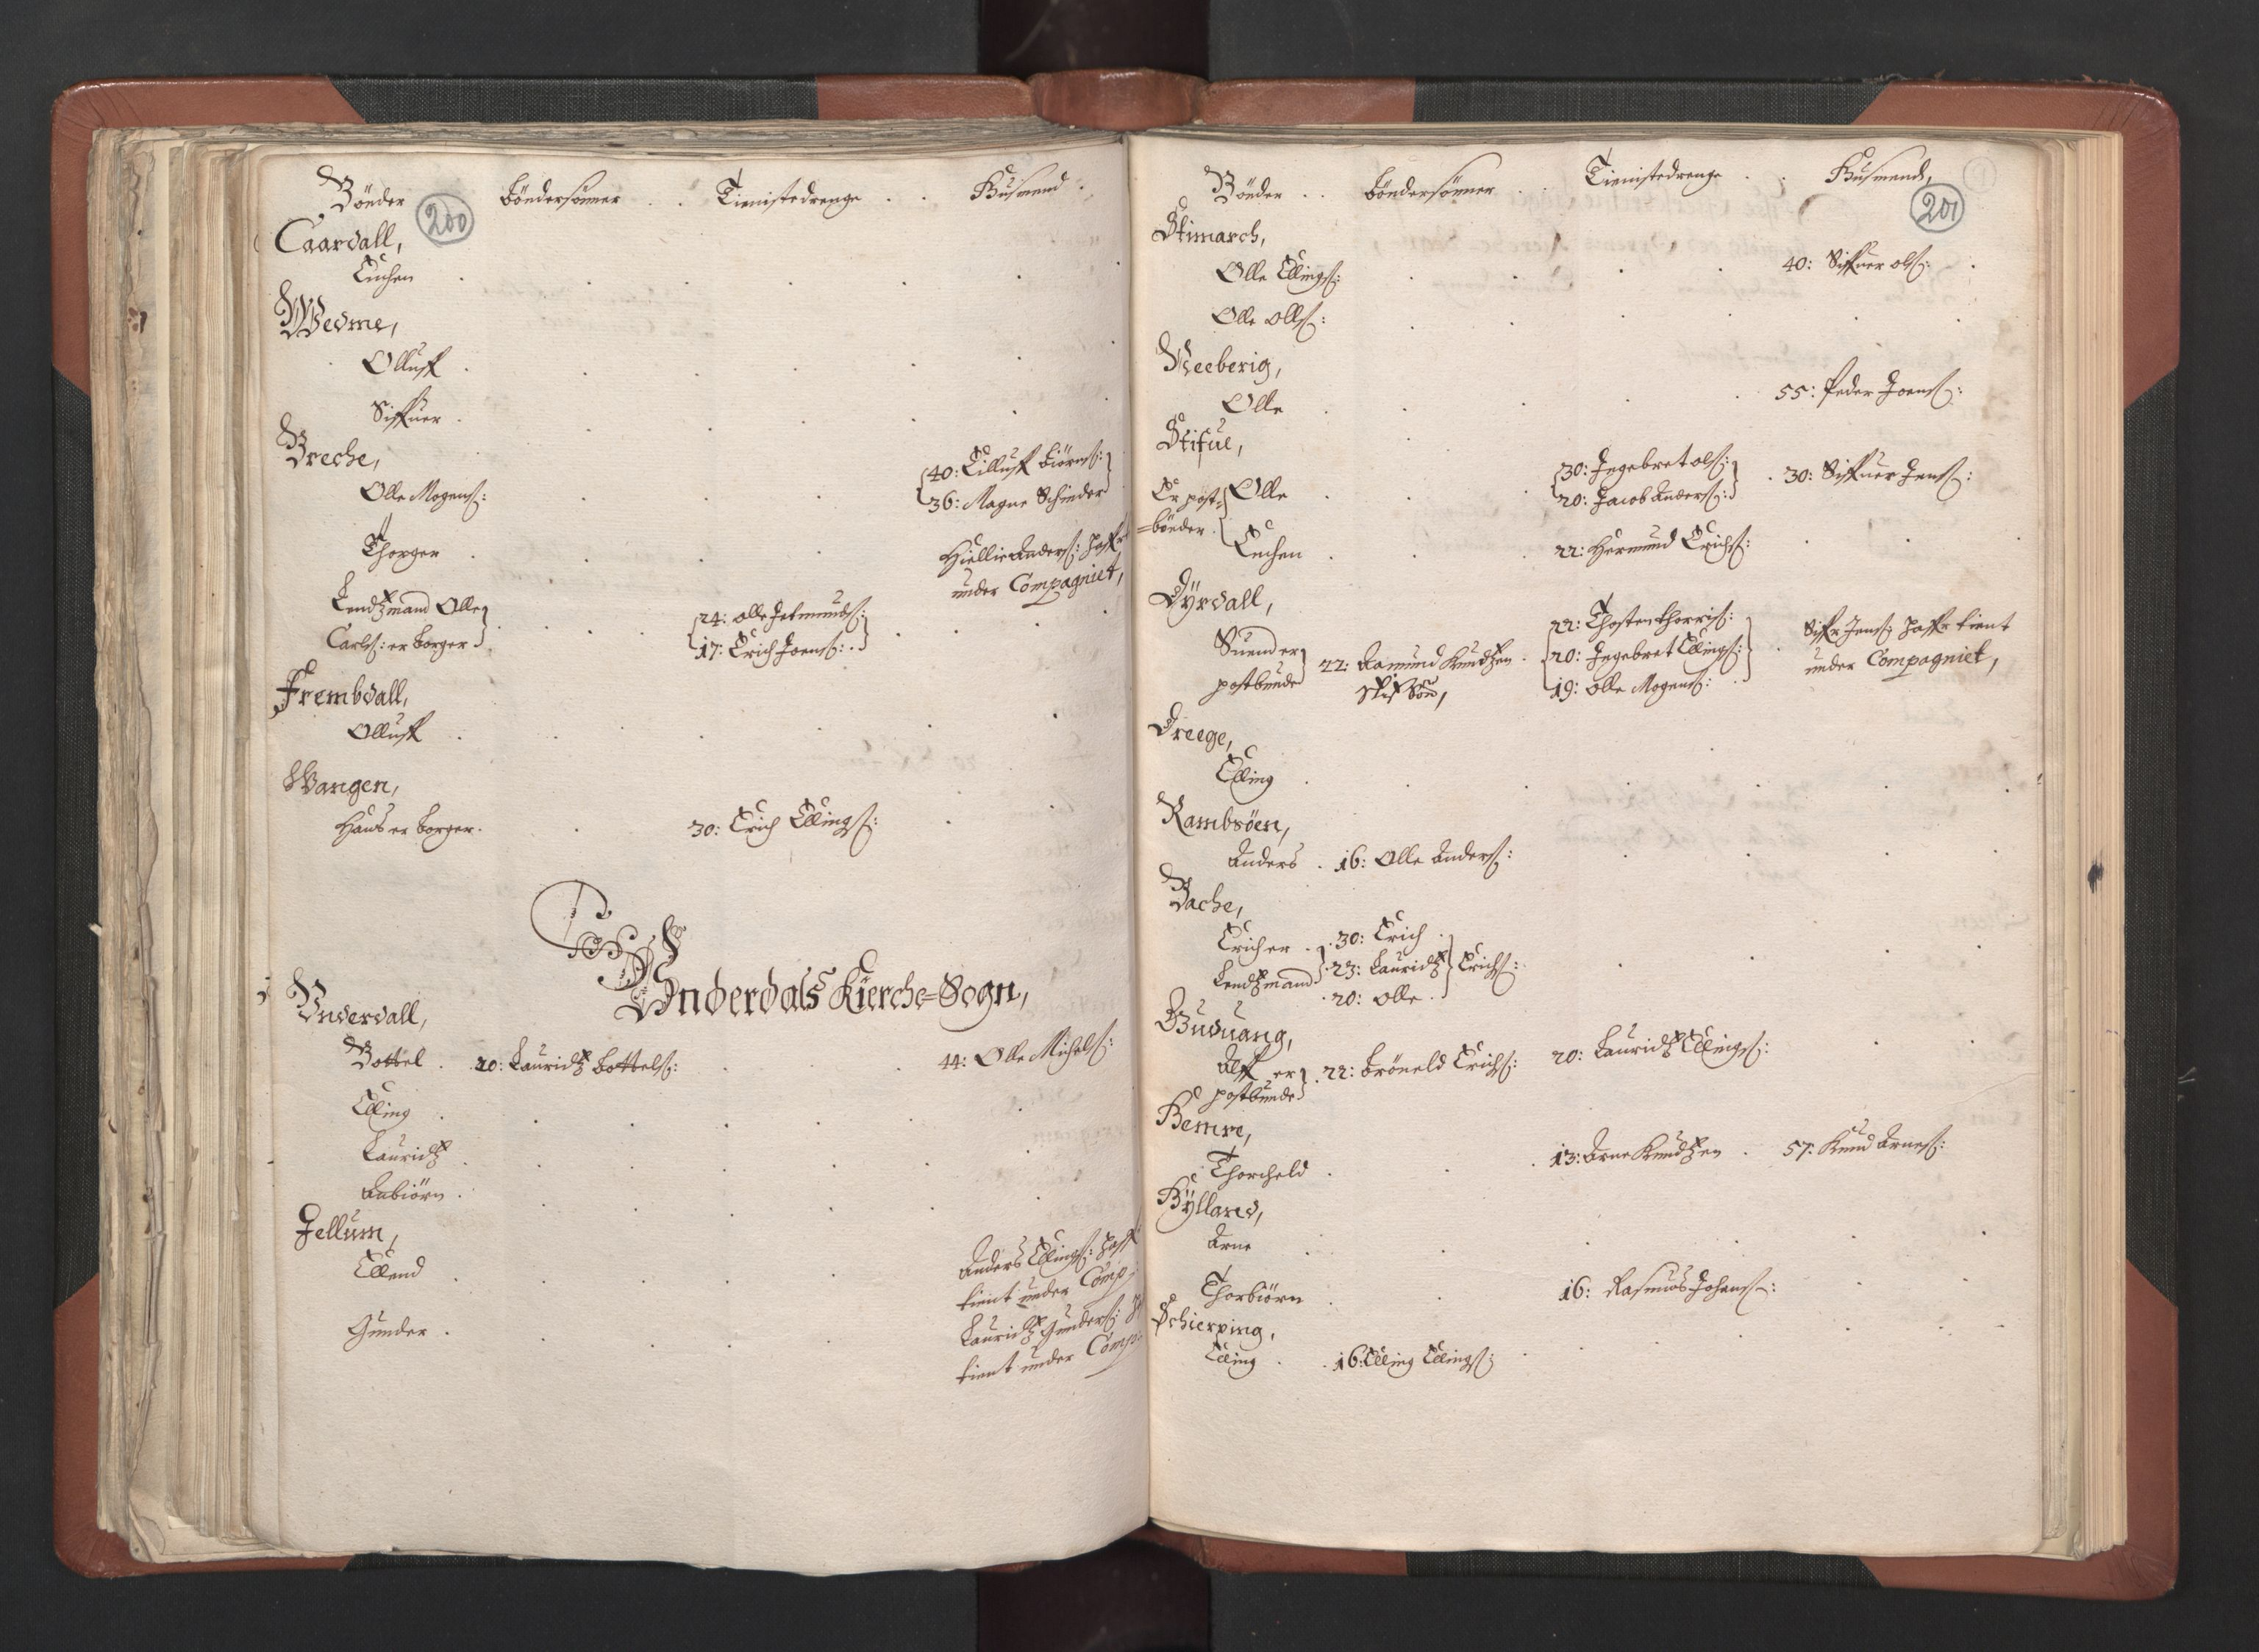 RA, Fogdenes og sorenskrivernes manntall 1664-1666, nr. 14: Hardanger len, Ytre Sogn fogderi og Indre Sogn fogderi, 1664-1665, s. 200-201